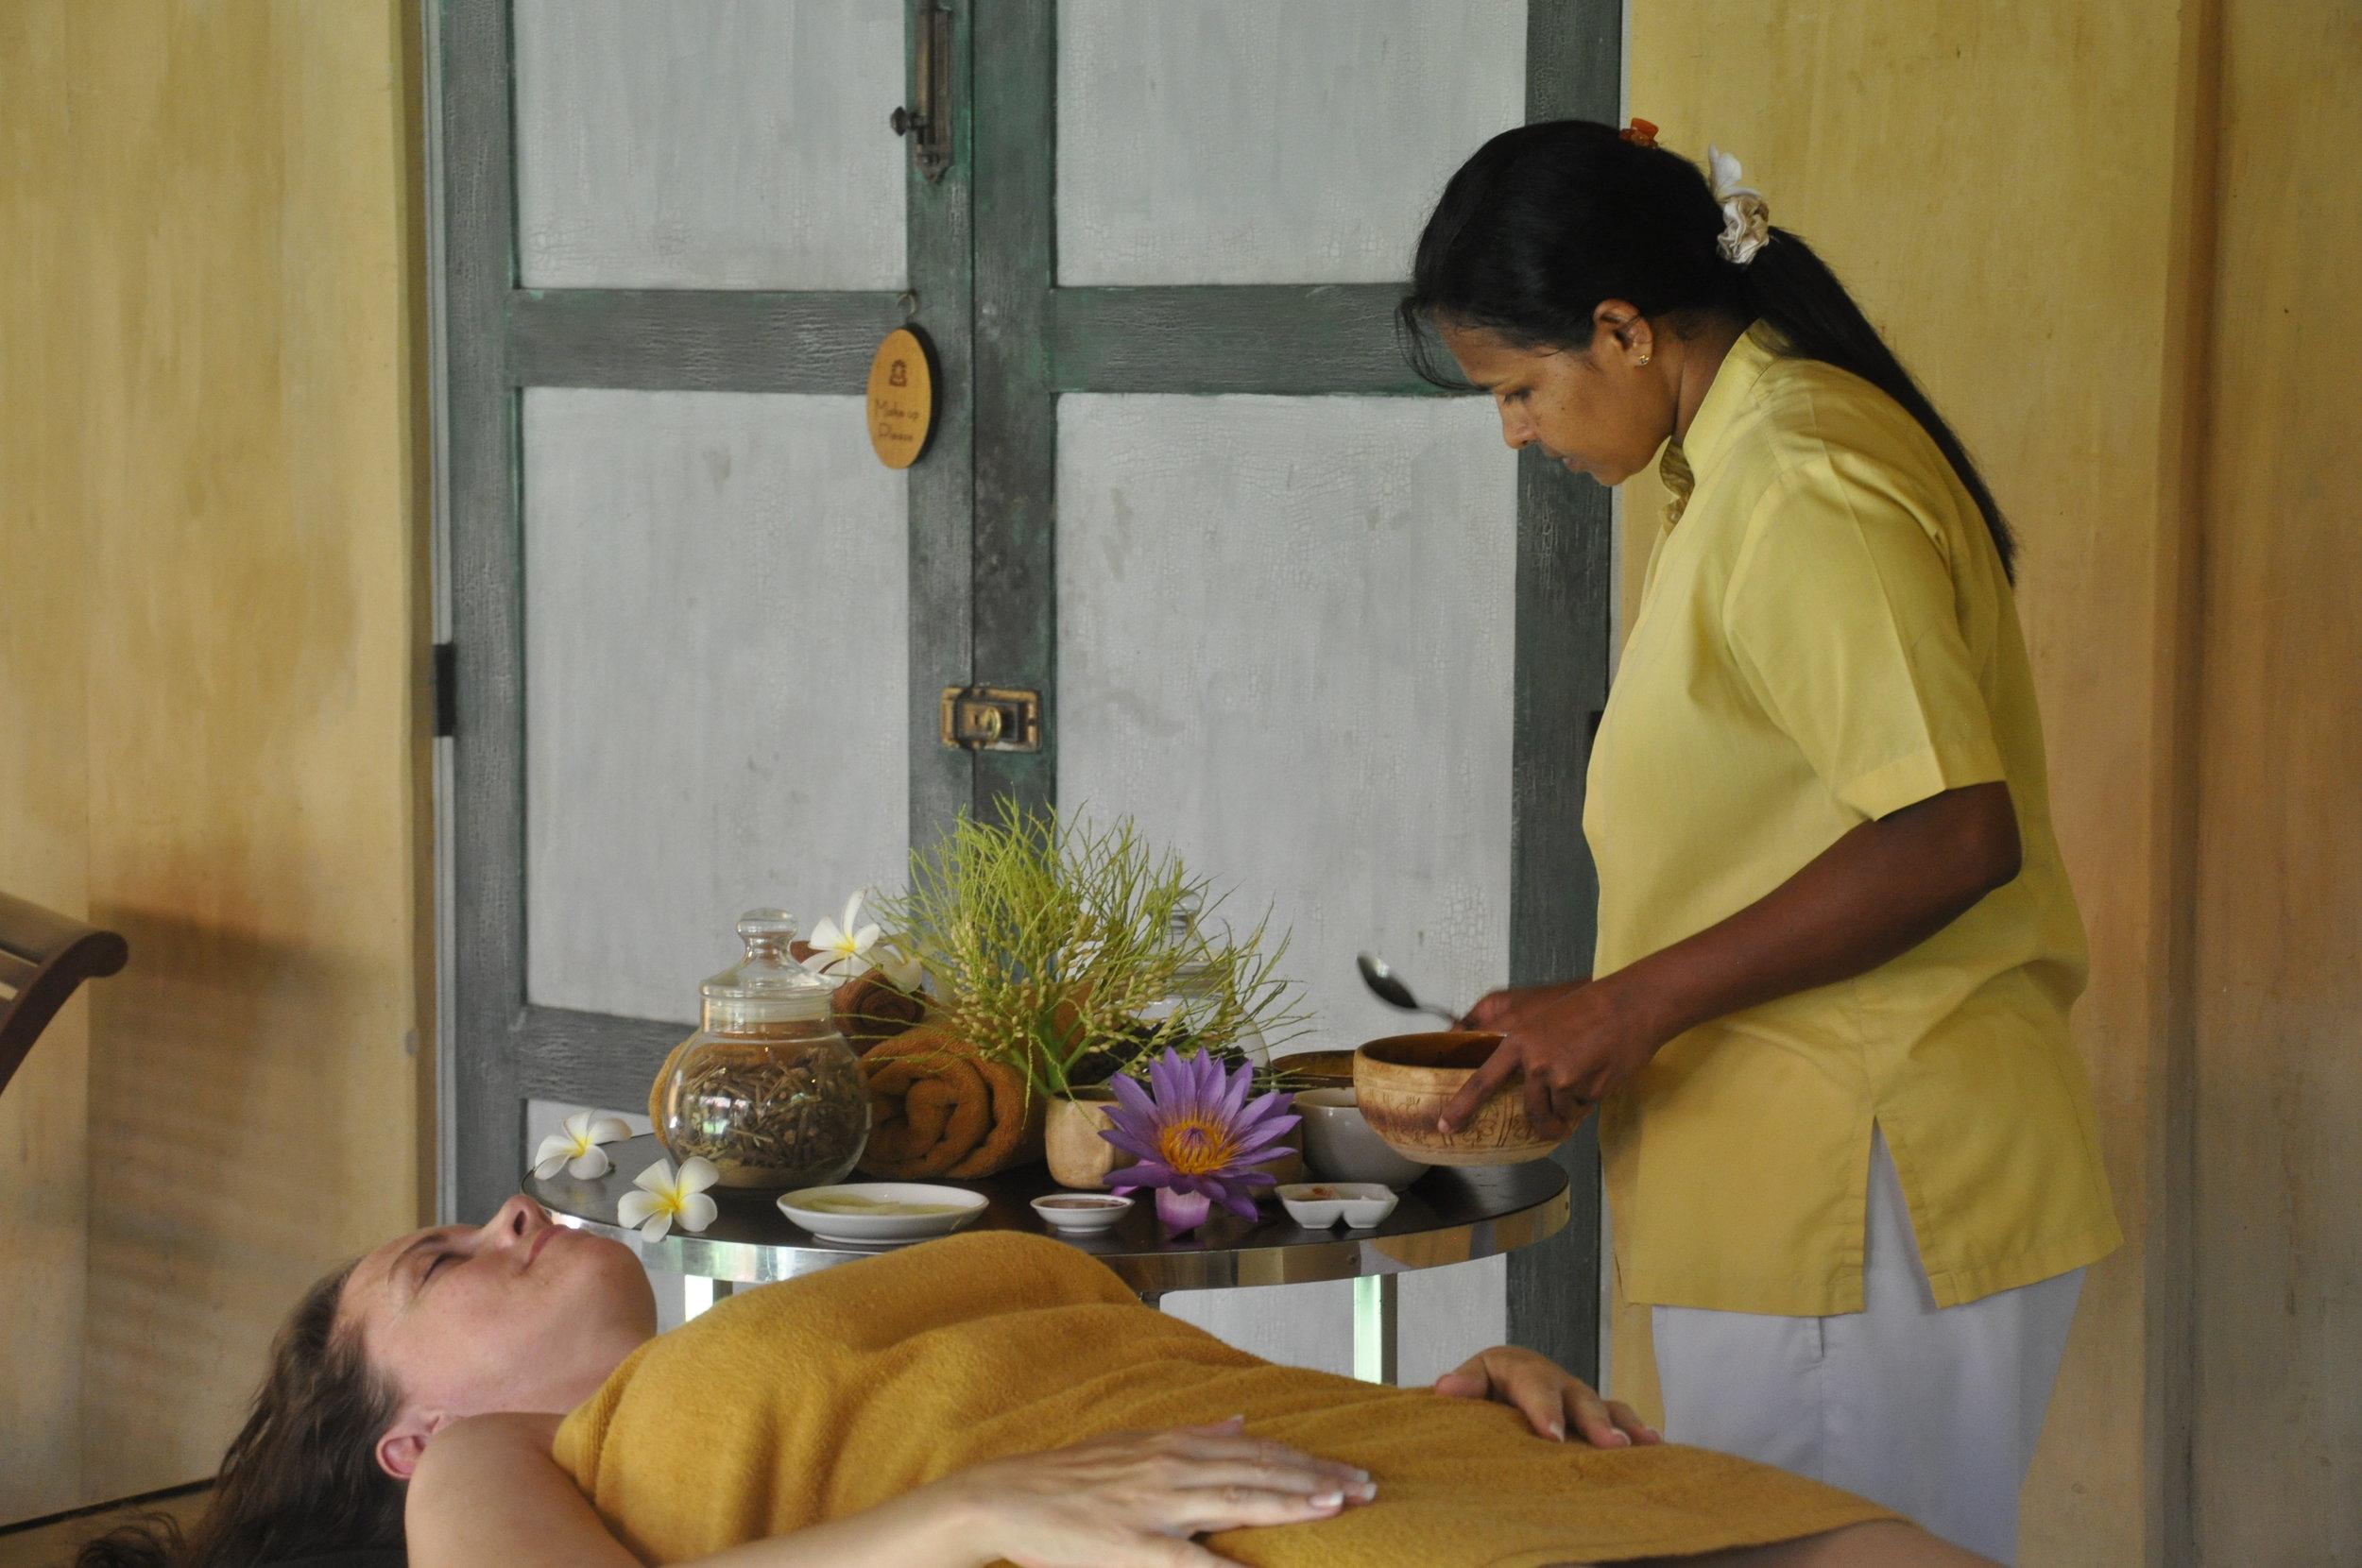 De ayurvedisk behandlinger er det rene nydelse